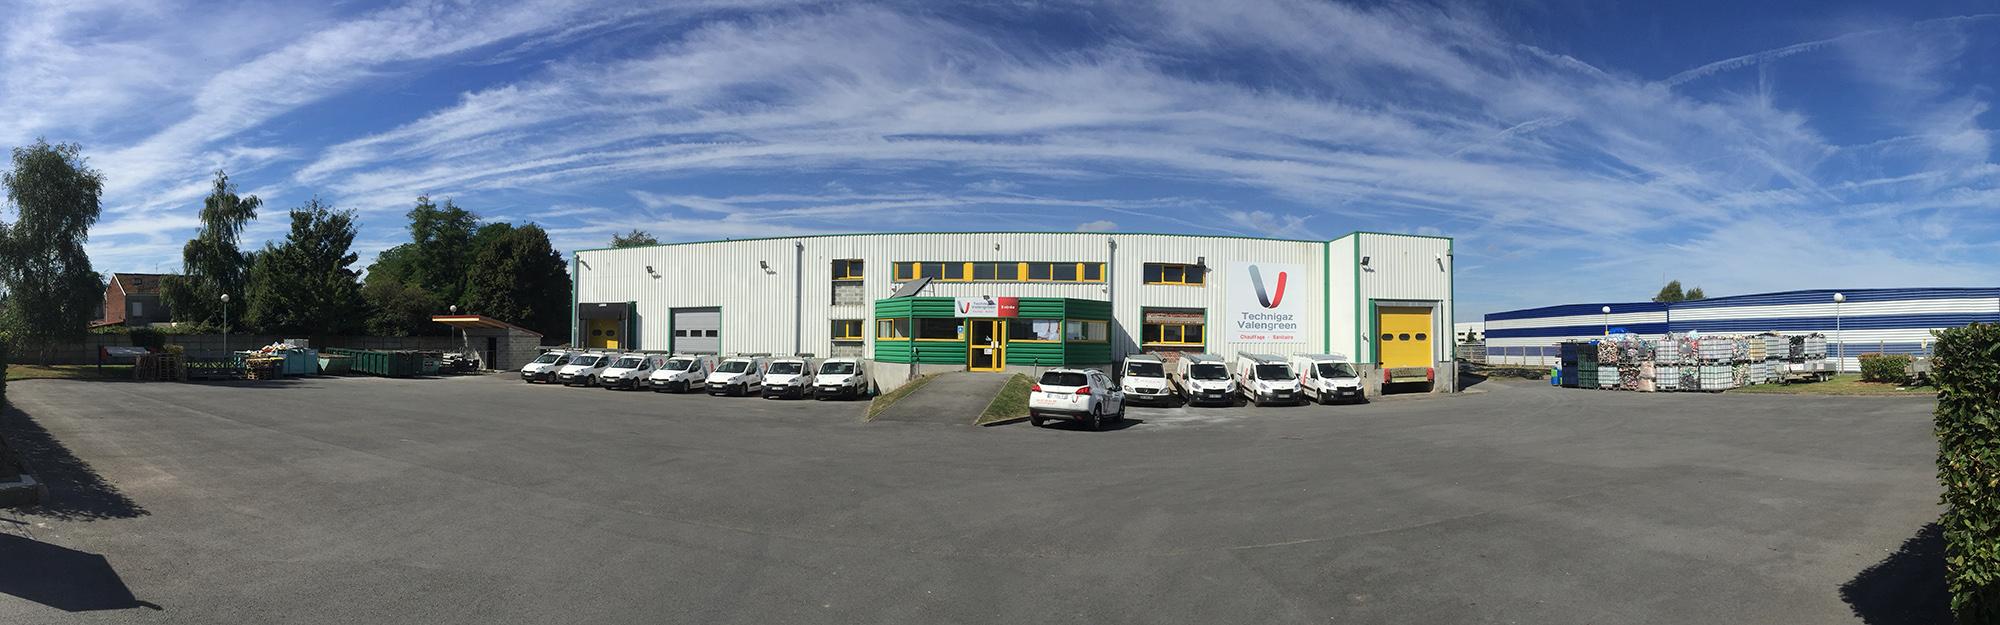 Locaux de Technigaz Valengreen SAS plombier chauffagiste expert Valenciennes